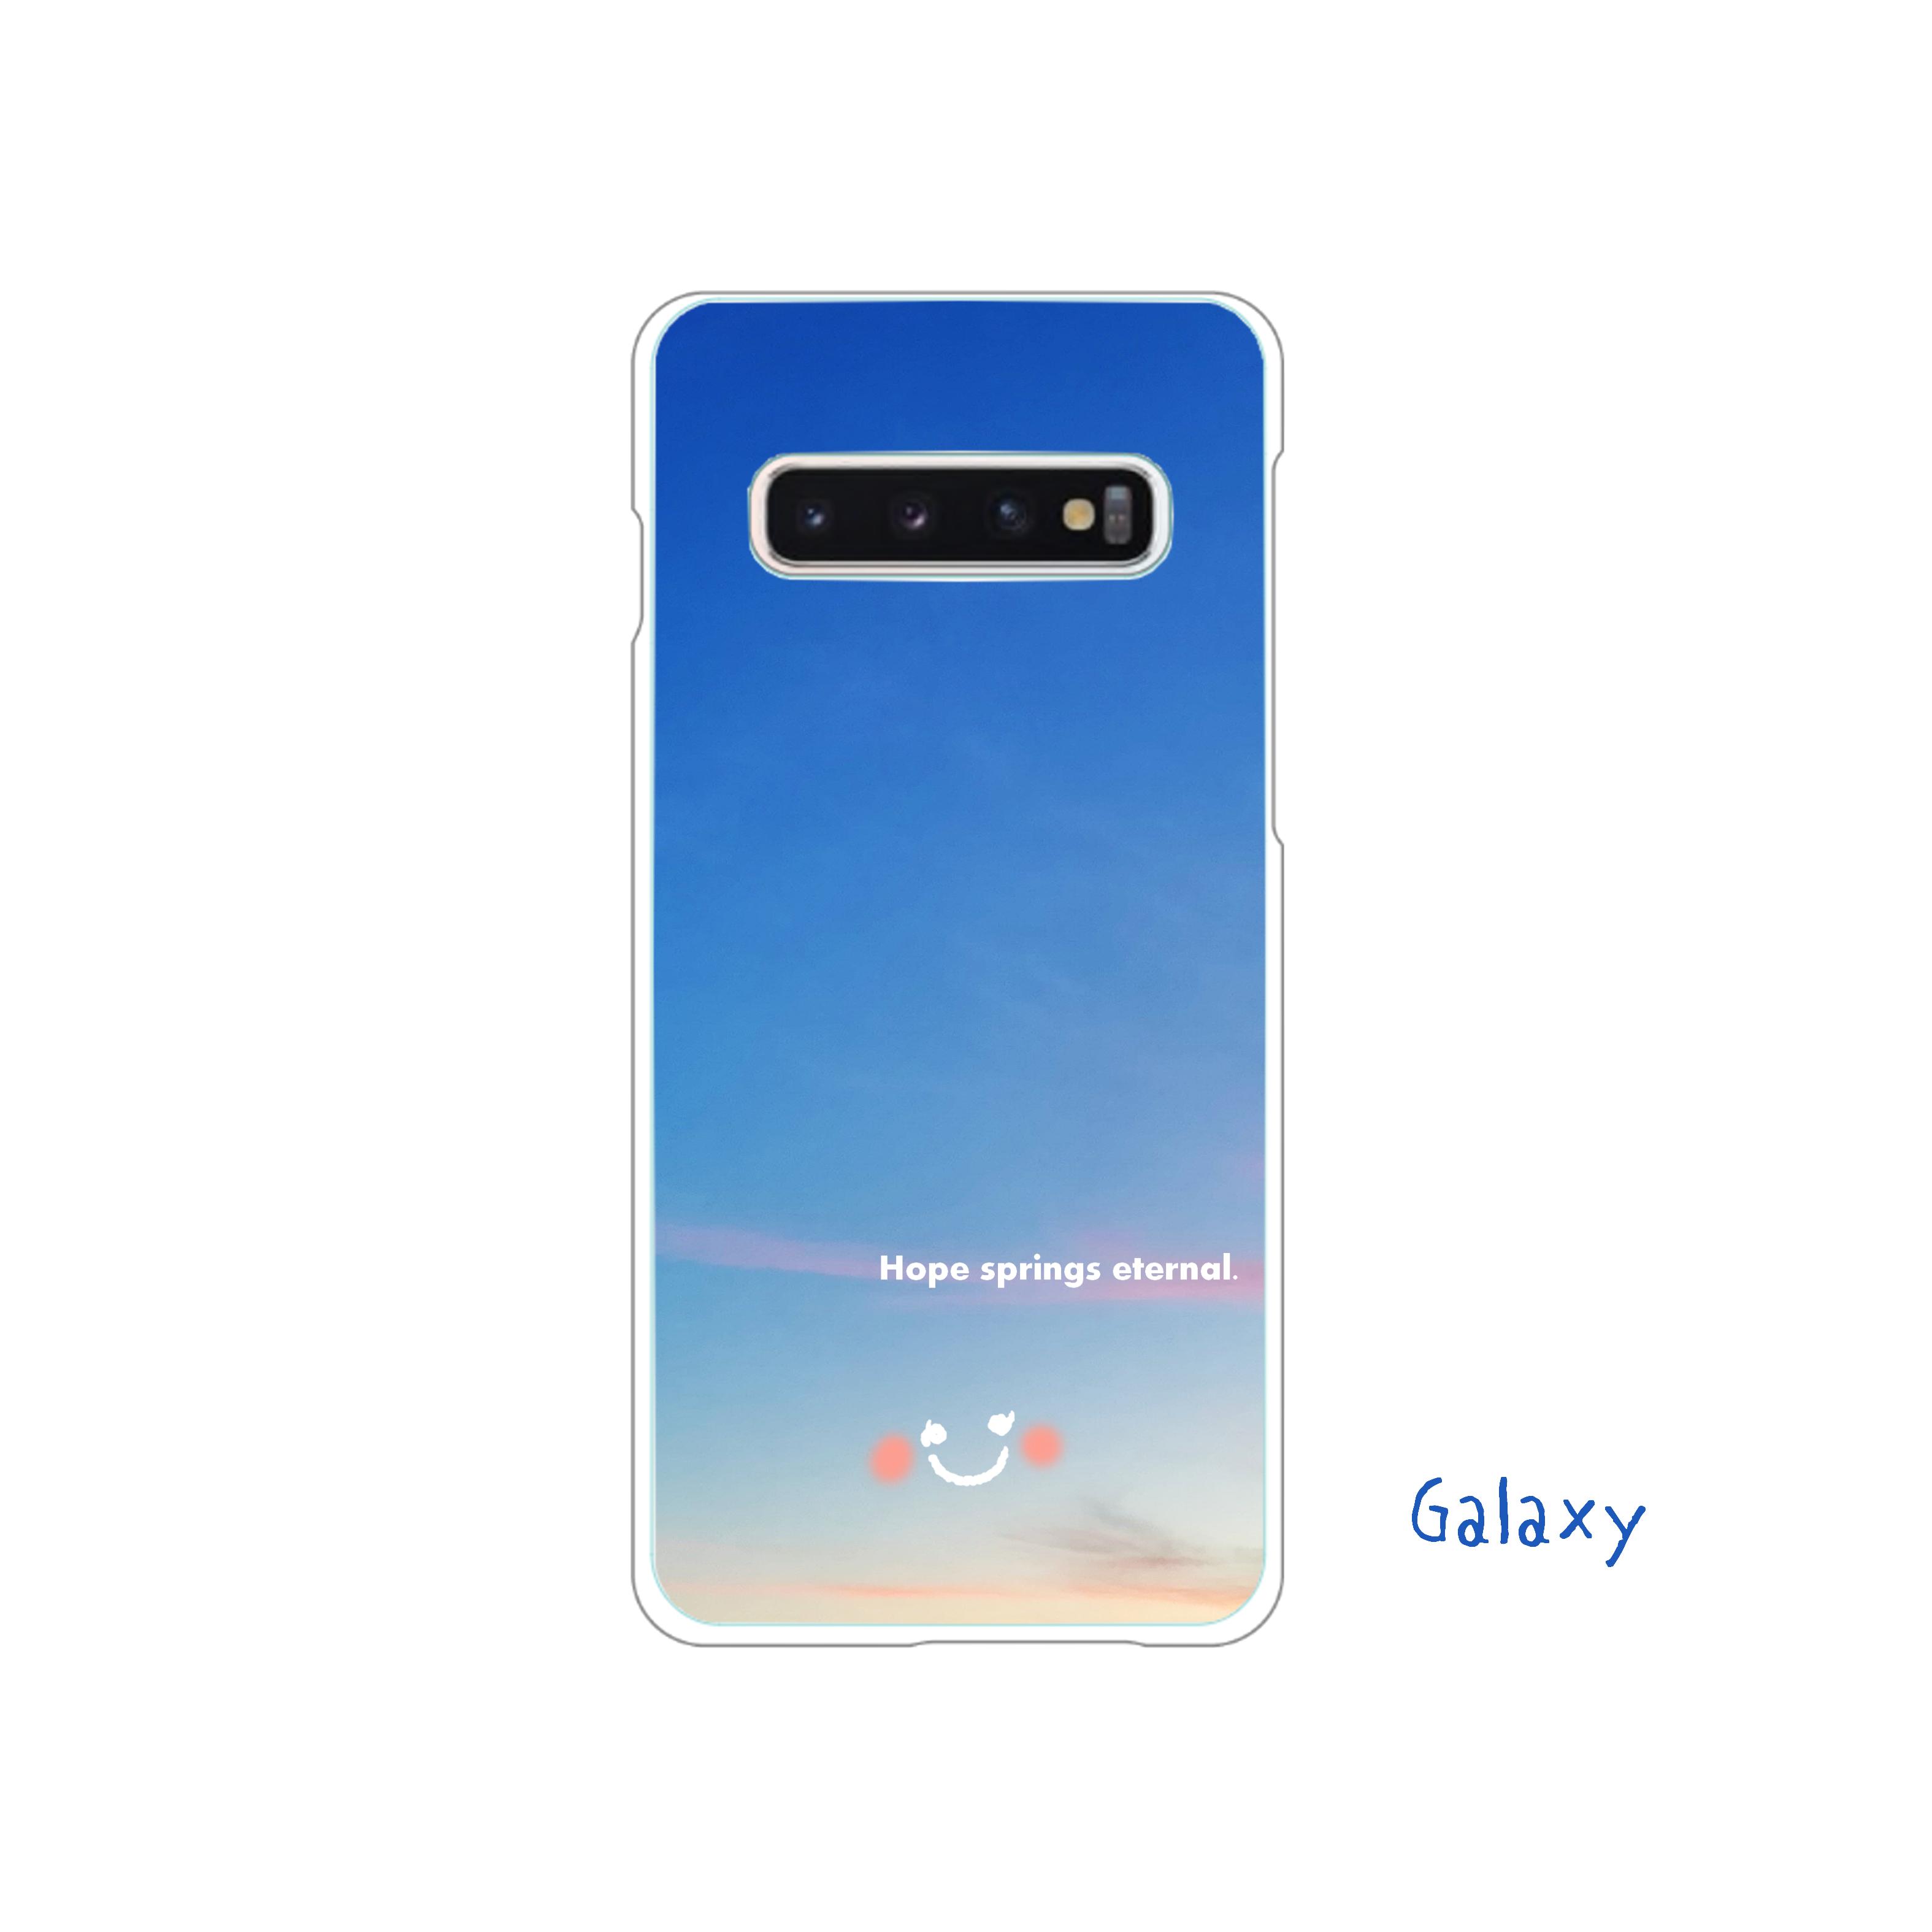 Hope springs eternal.     (Galaxy) Galaxy S10+ (SC-04L/SCV42)